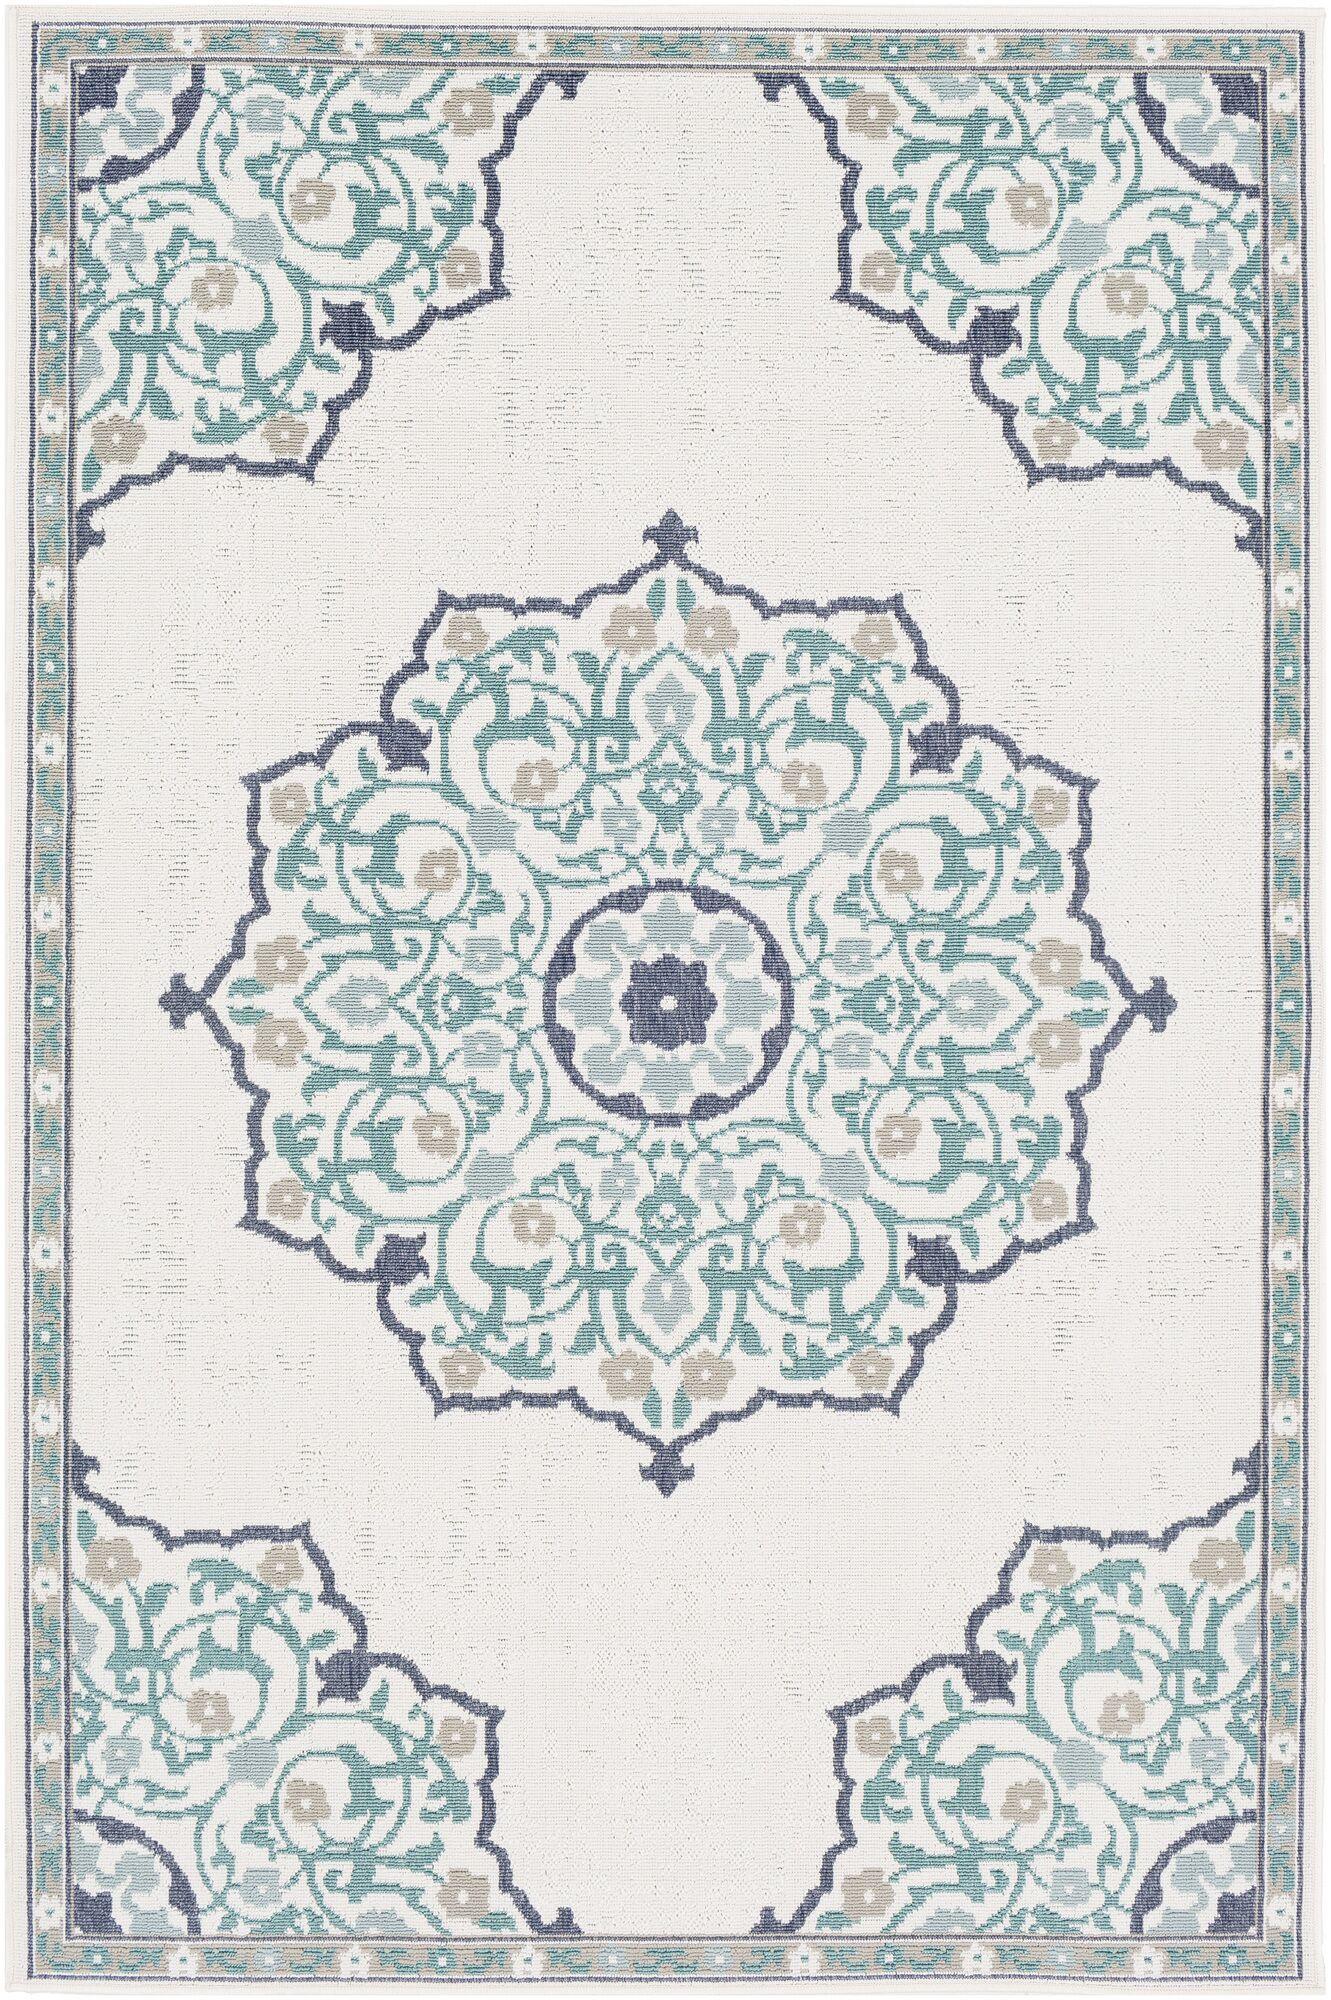 Dutcher Floral Teal/Ivory Indoor/Outdoor Area Rug Rug Size: Rectangle 6' x 9'